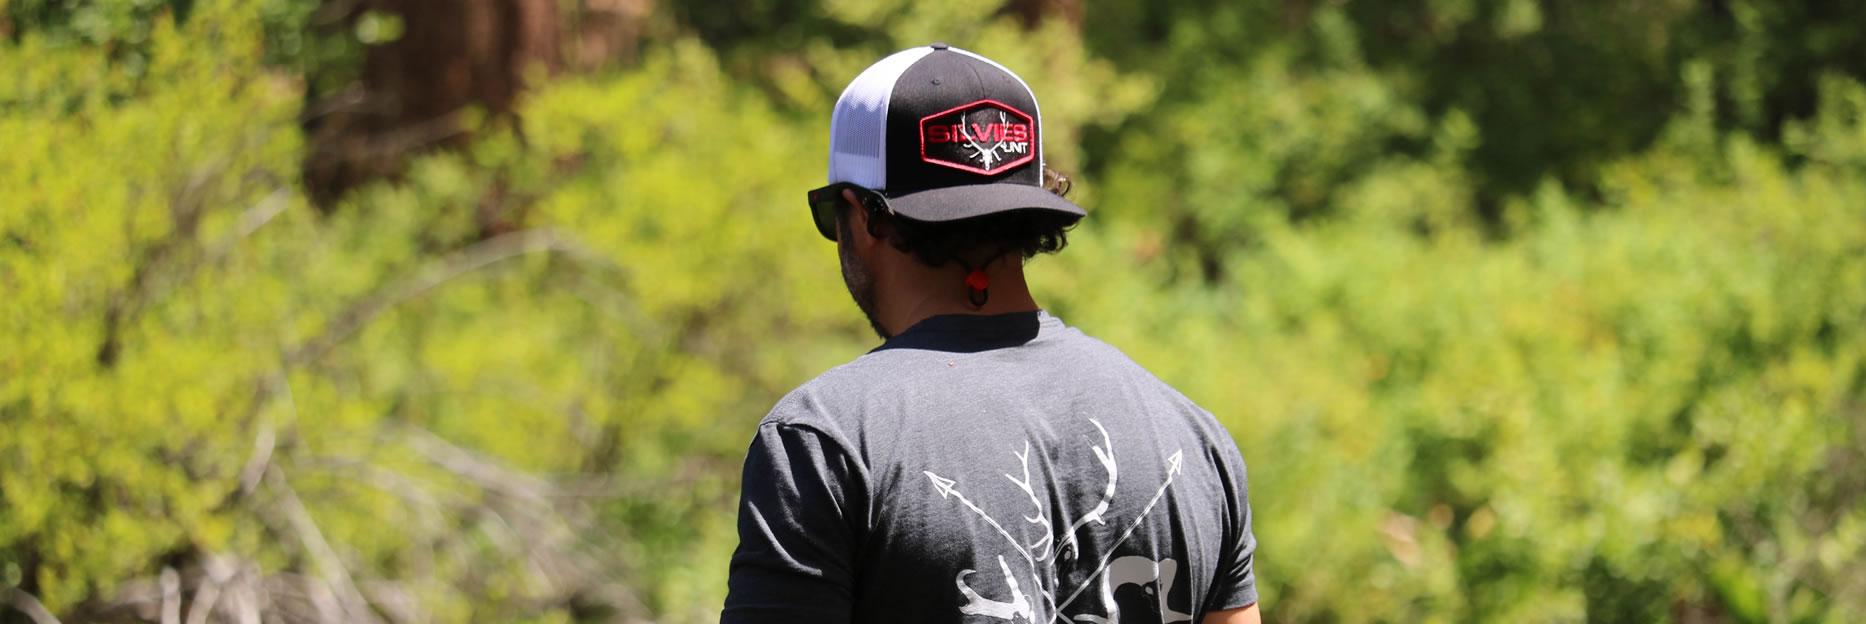 Hiking - Hunting inspired clothing